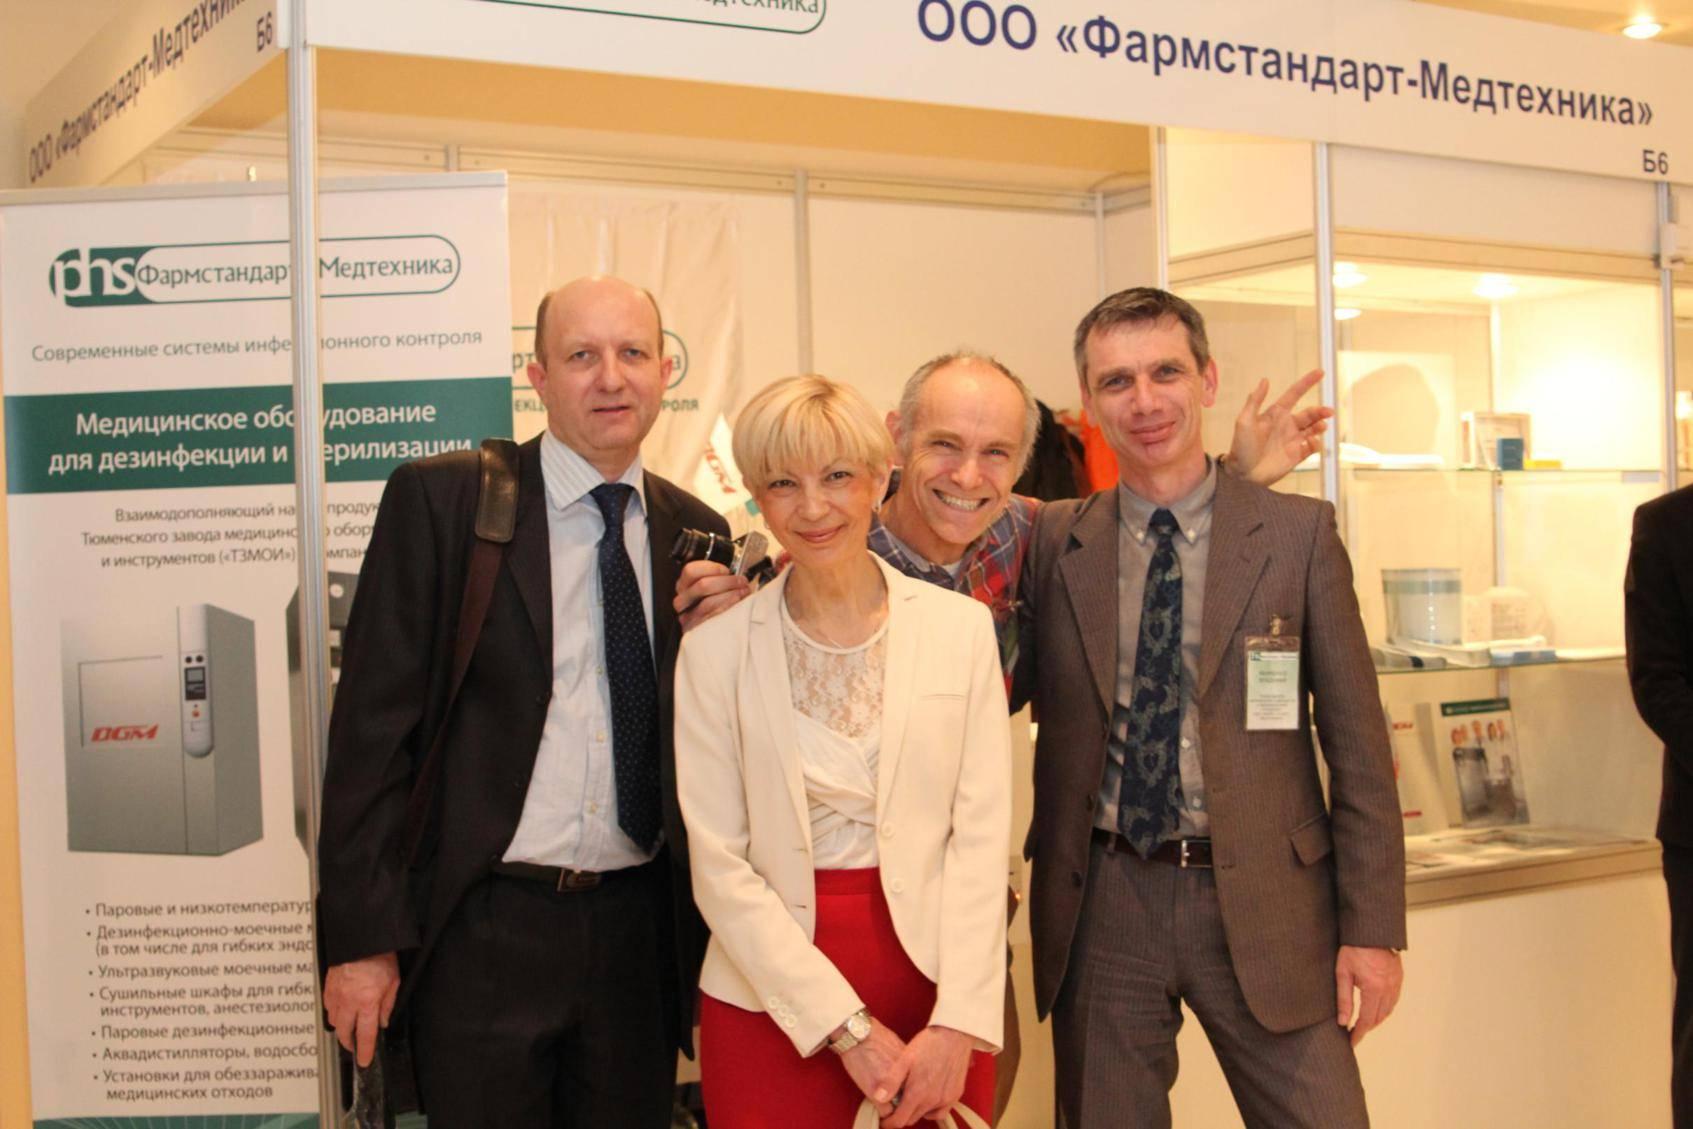 07 RUS Moscow Municipality 20130404 Exhibition PHS Booth Vladimir Elena Jan Vladimir